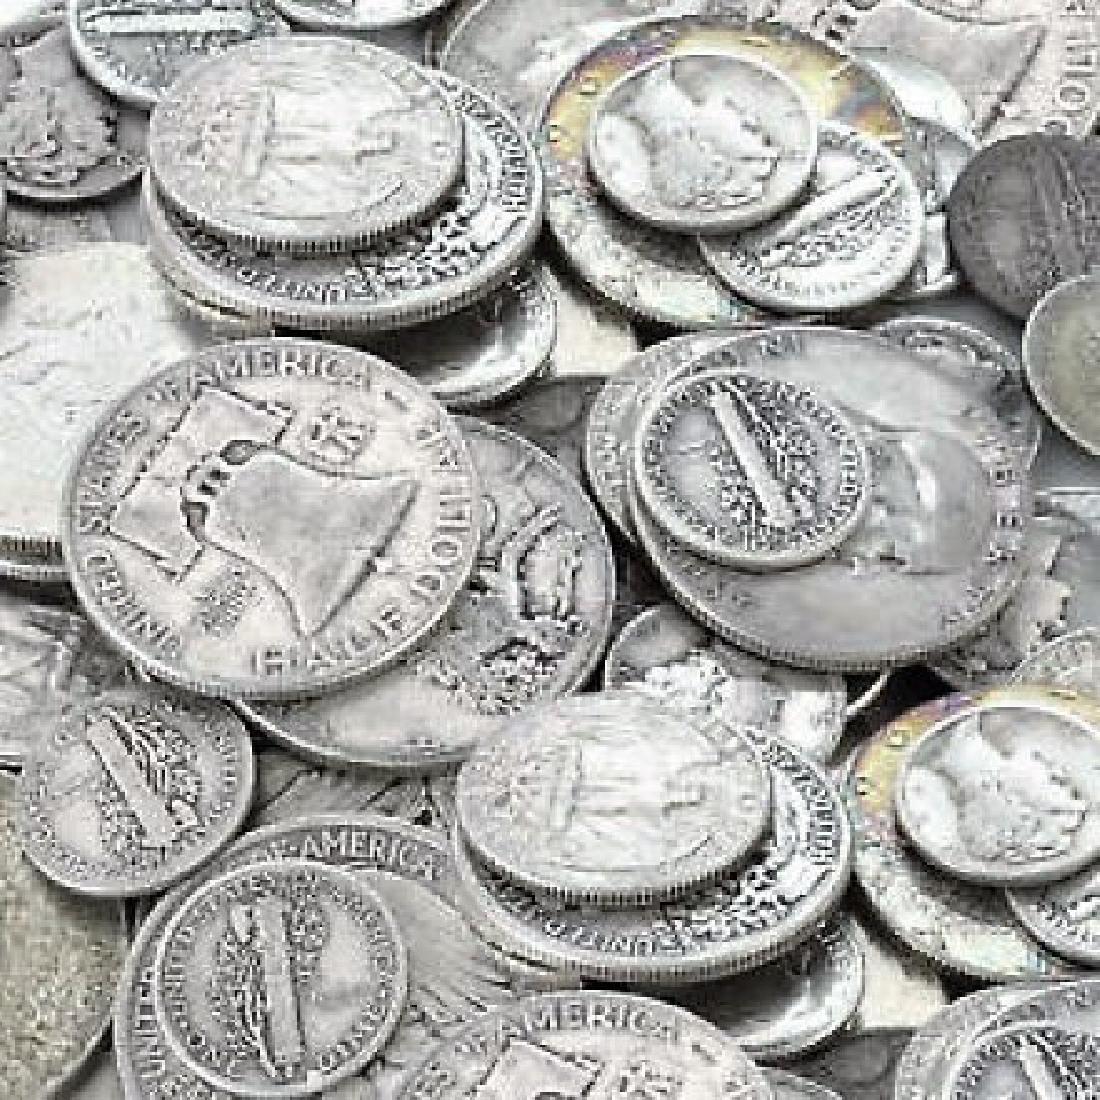 $10 face Value 90% Silver Mix - Investors Lot